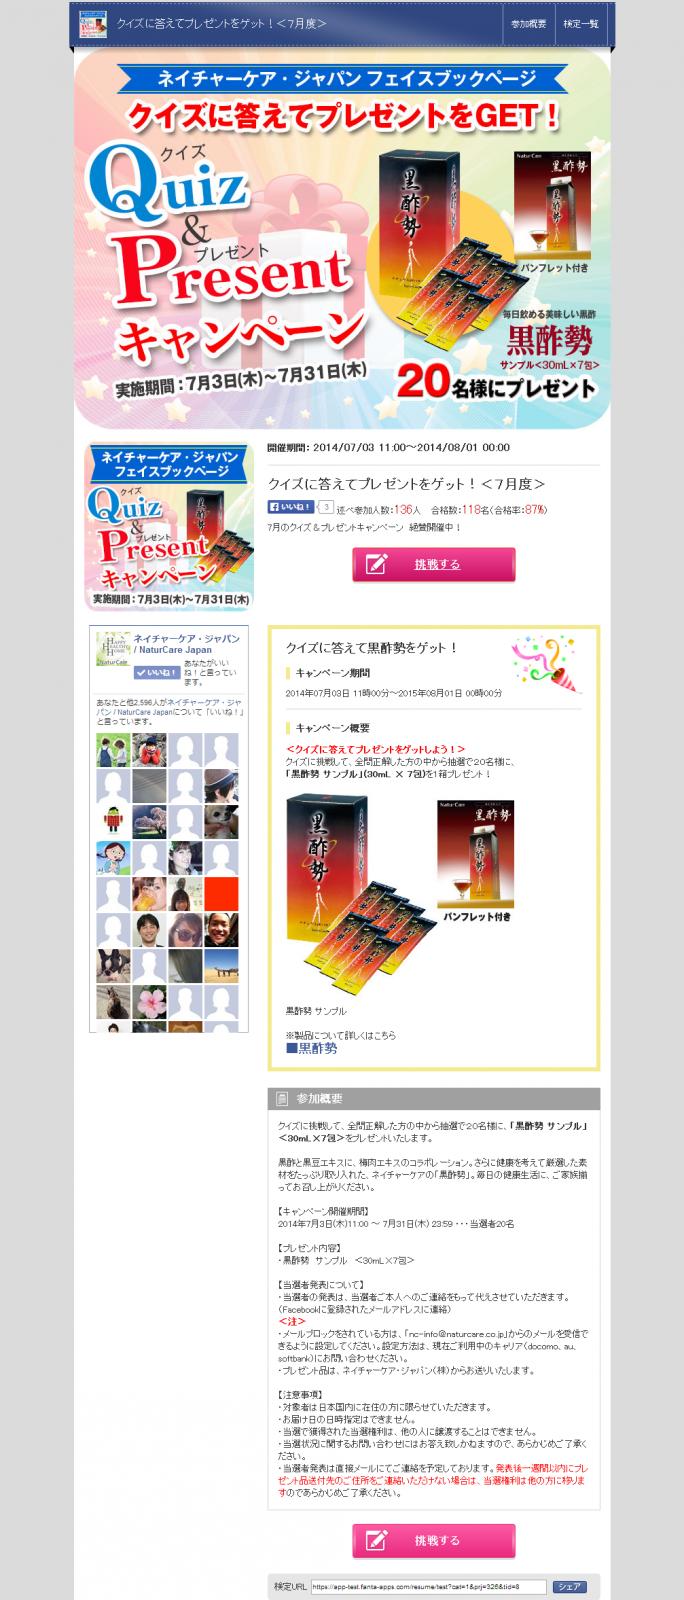 Fantastics検定コンテンツ(ネイチャーケア・ジャパン株式会社 様)